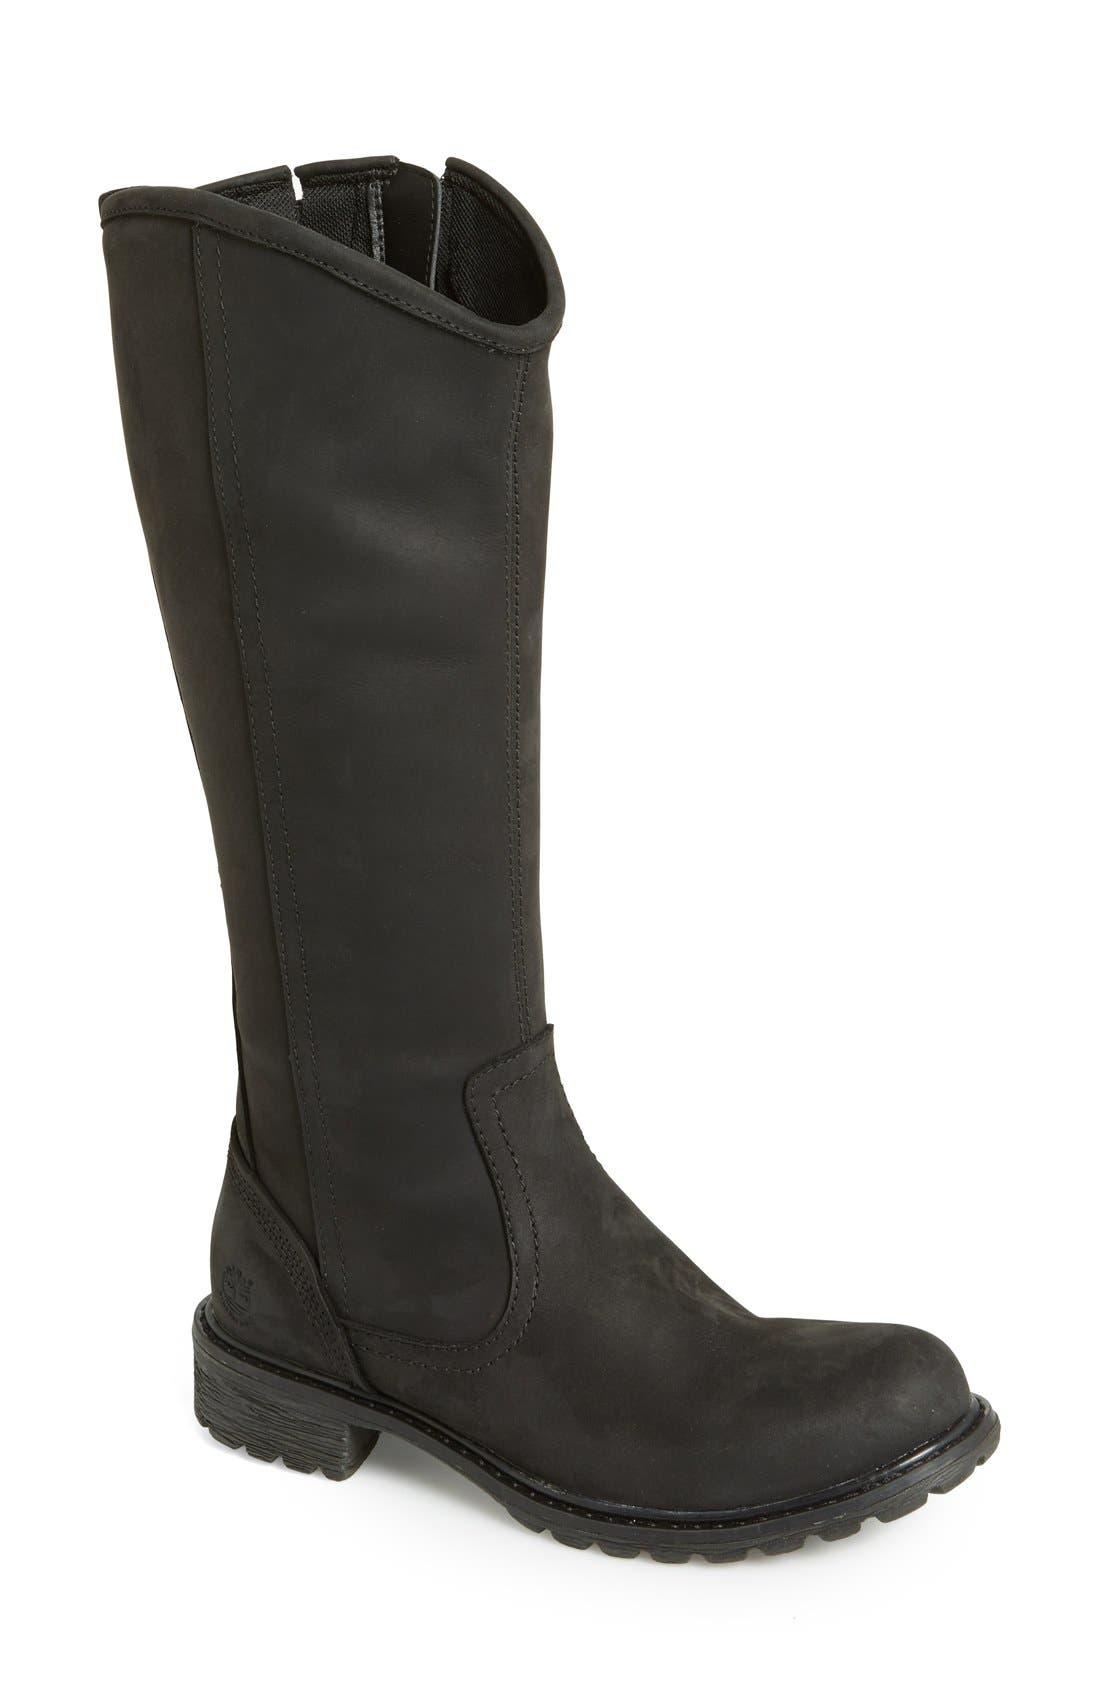 Main Image - Timberland Earthkeepers® 'Stoddard' Tall Waterproof Boot (Women)